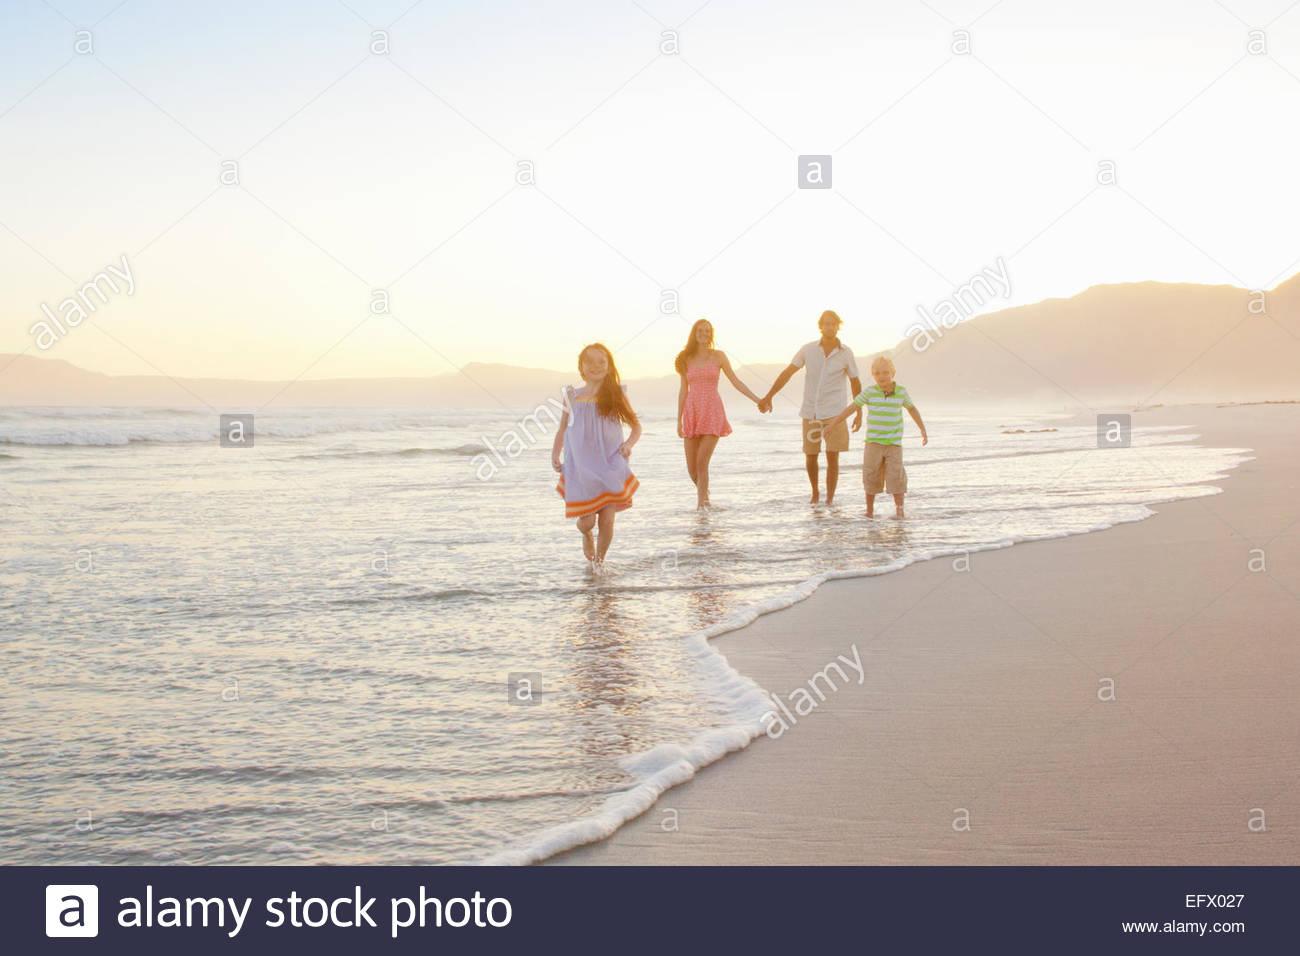 Familia Feliz celebración manos en sunny beach Imagen De Stock